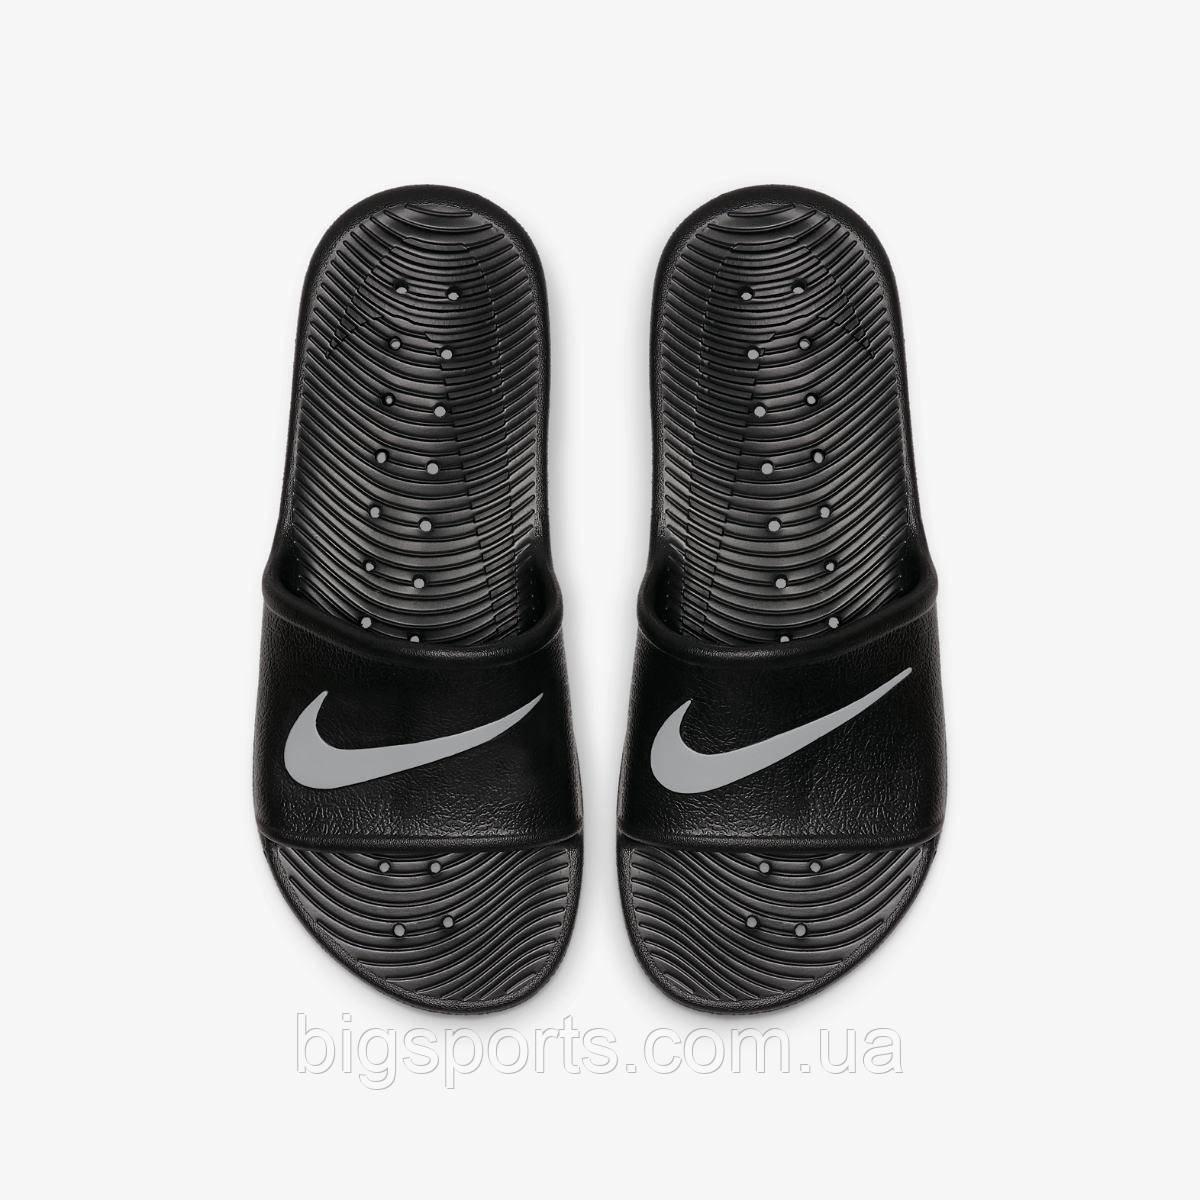 Тапки жен. Nike Wmns Kawa Shower (арт. 832655-003), фото 1